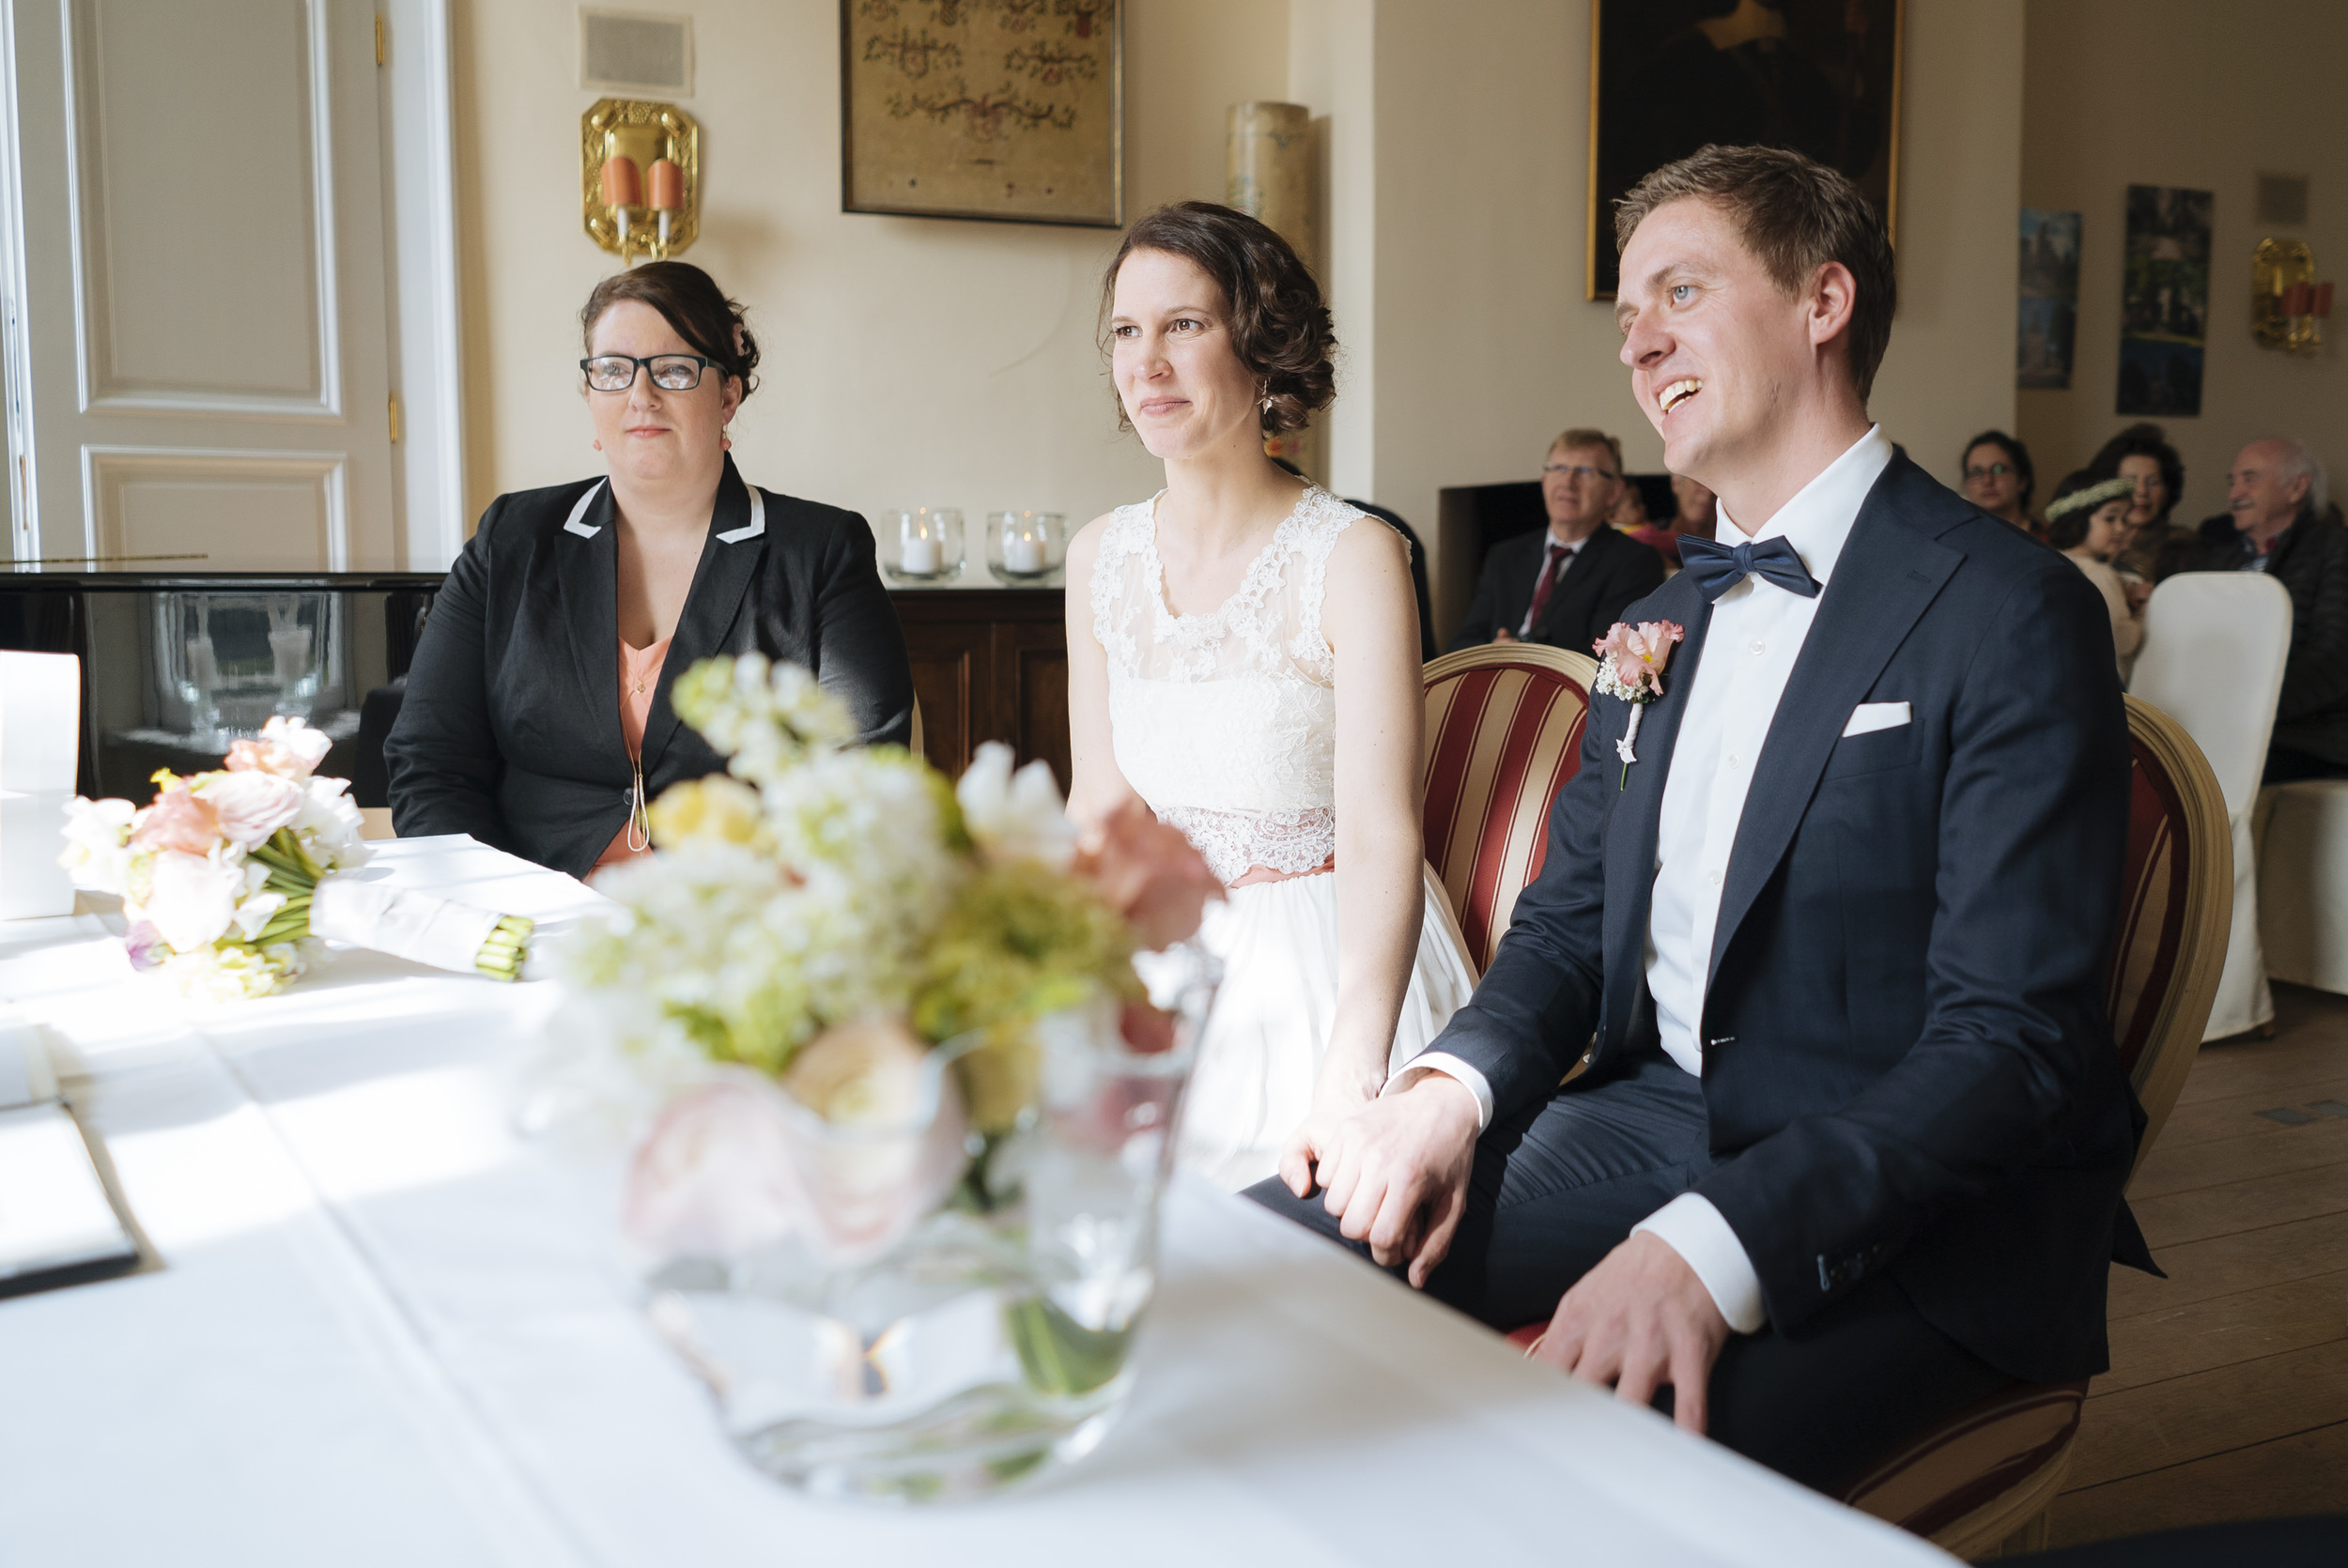 Hochzeitsfotograf-Schlossruine-Hertefeld-Weeze-066.jpg